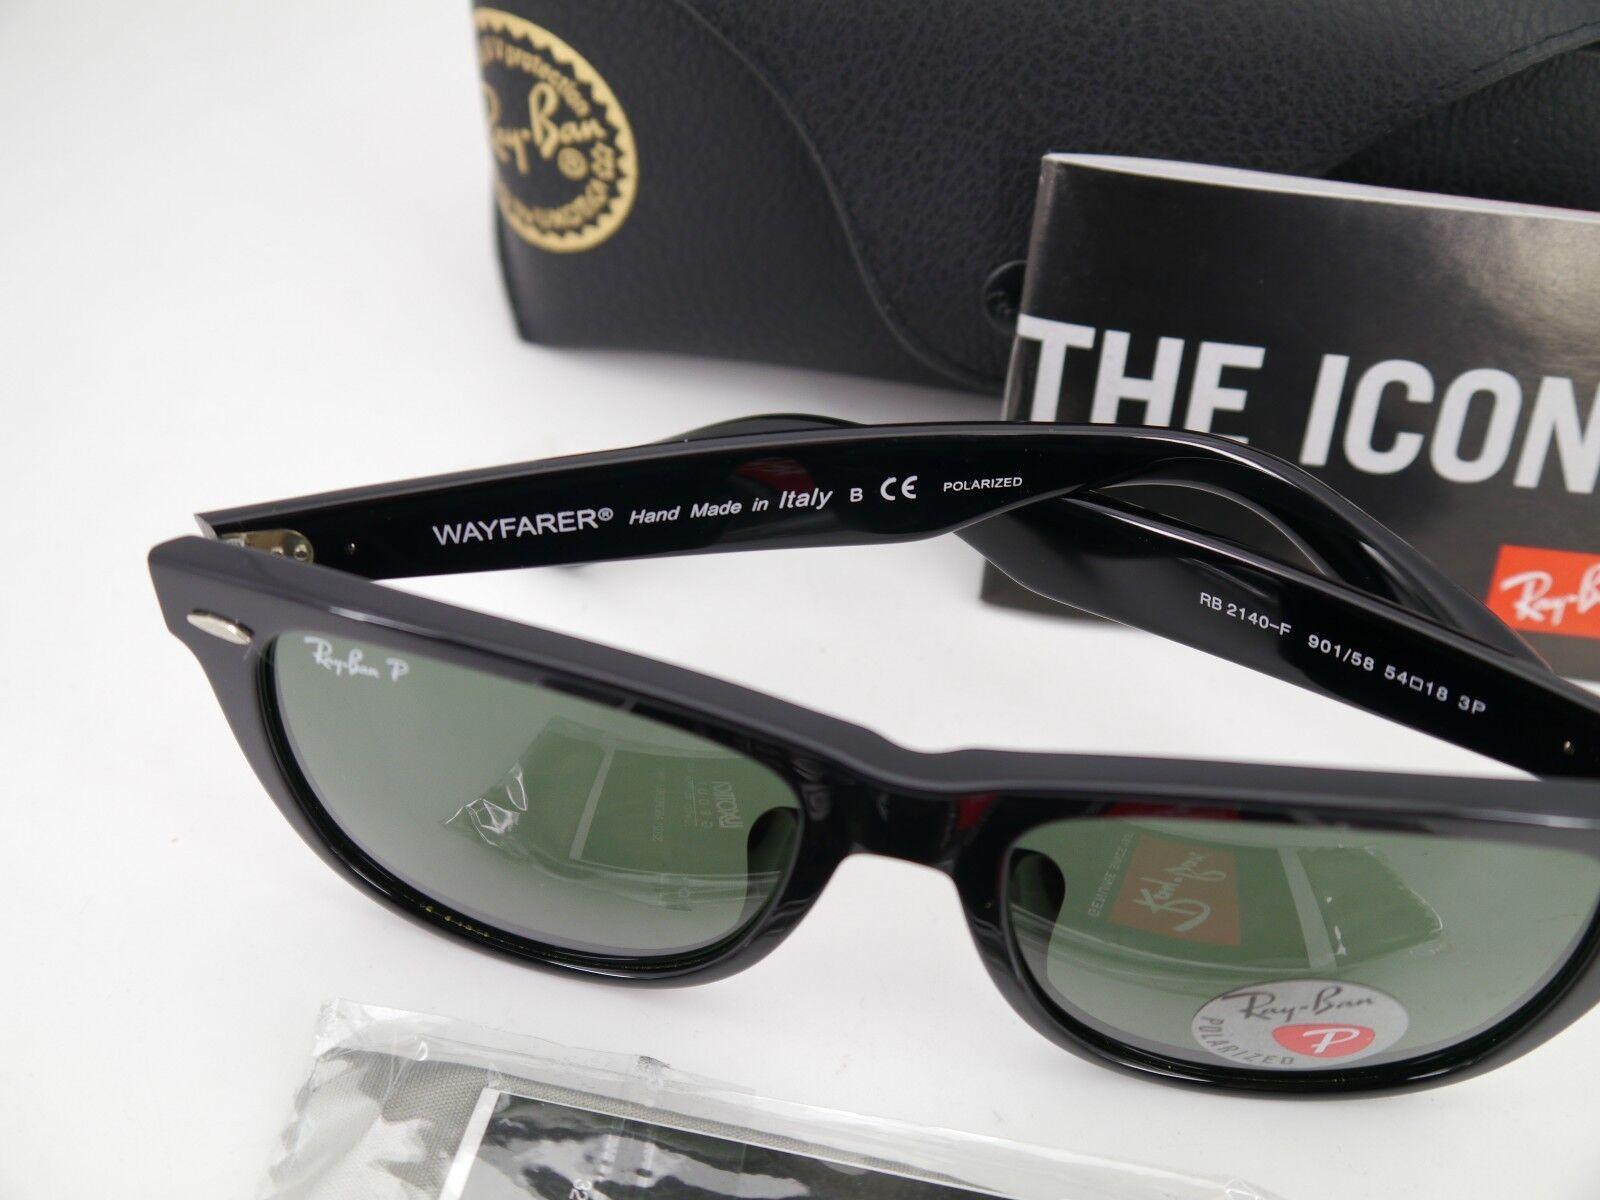 a656b4a242a18 Ray-Ban Rb2140 Original Wayfarer Sunglasses Black Frame crystal ...